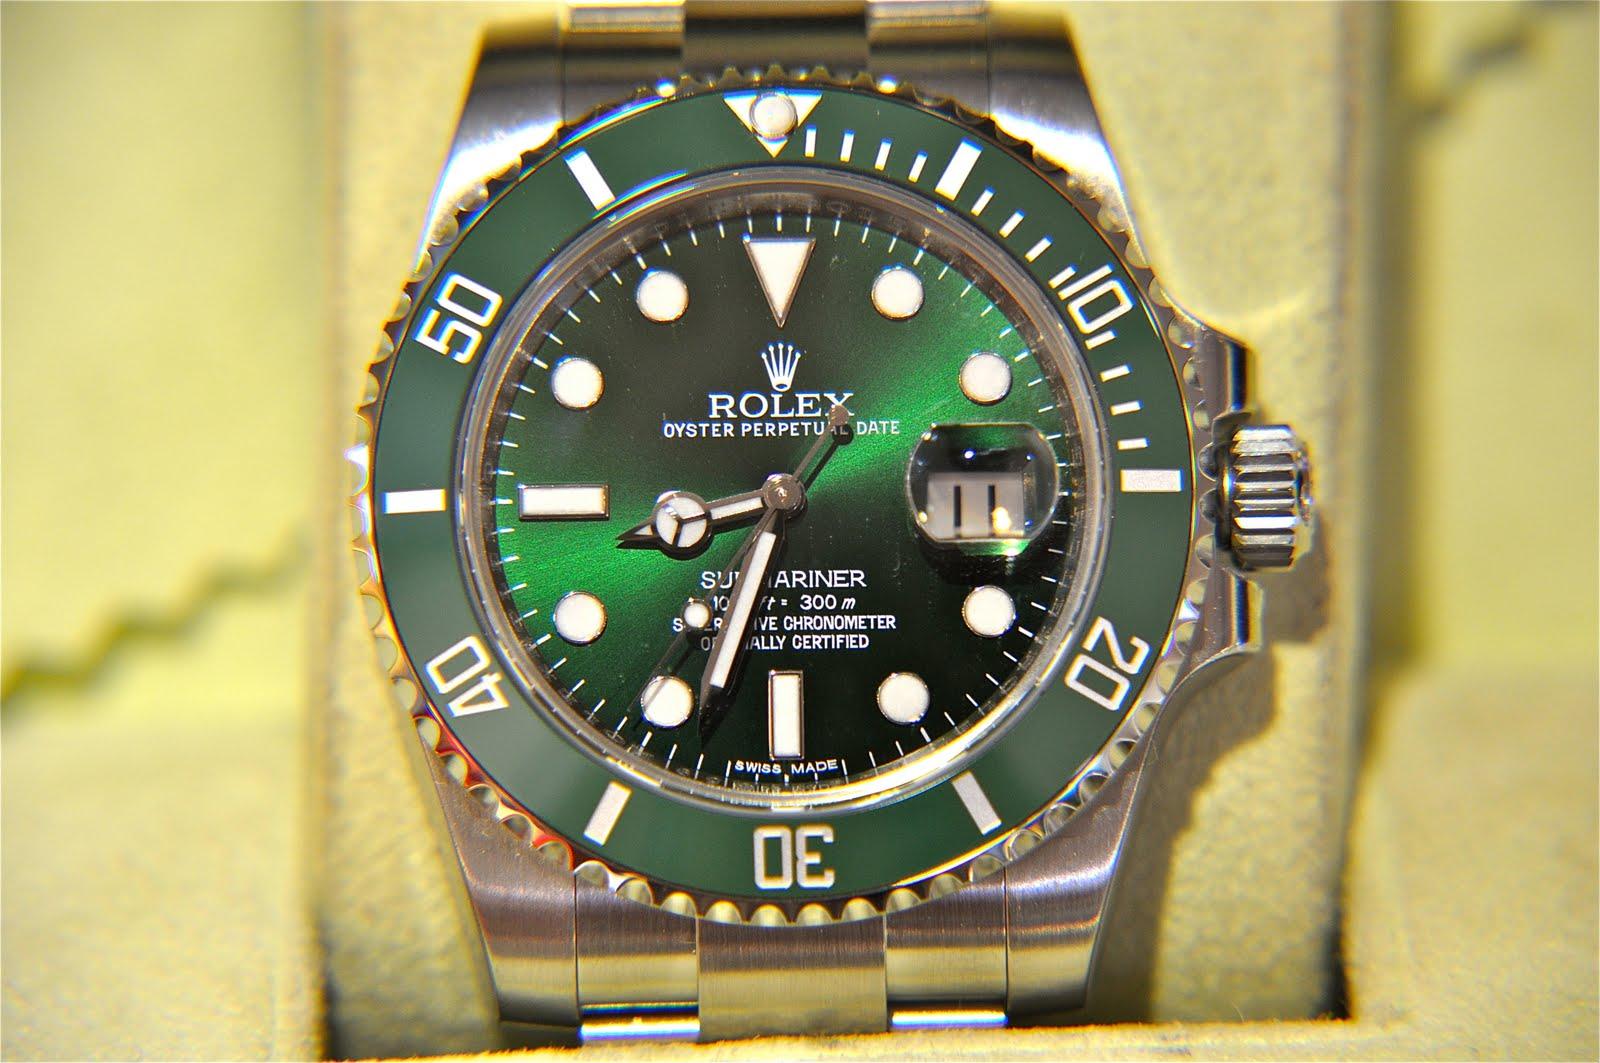 lt watch gallery 318 authentic luxury rolex submariner ceramic